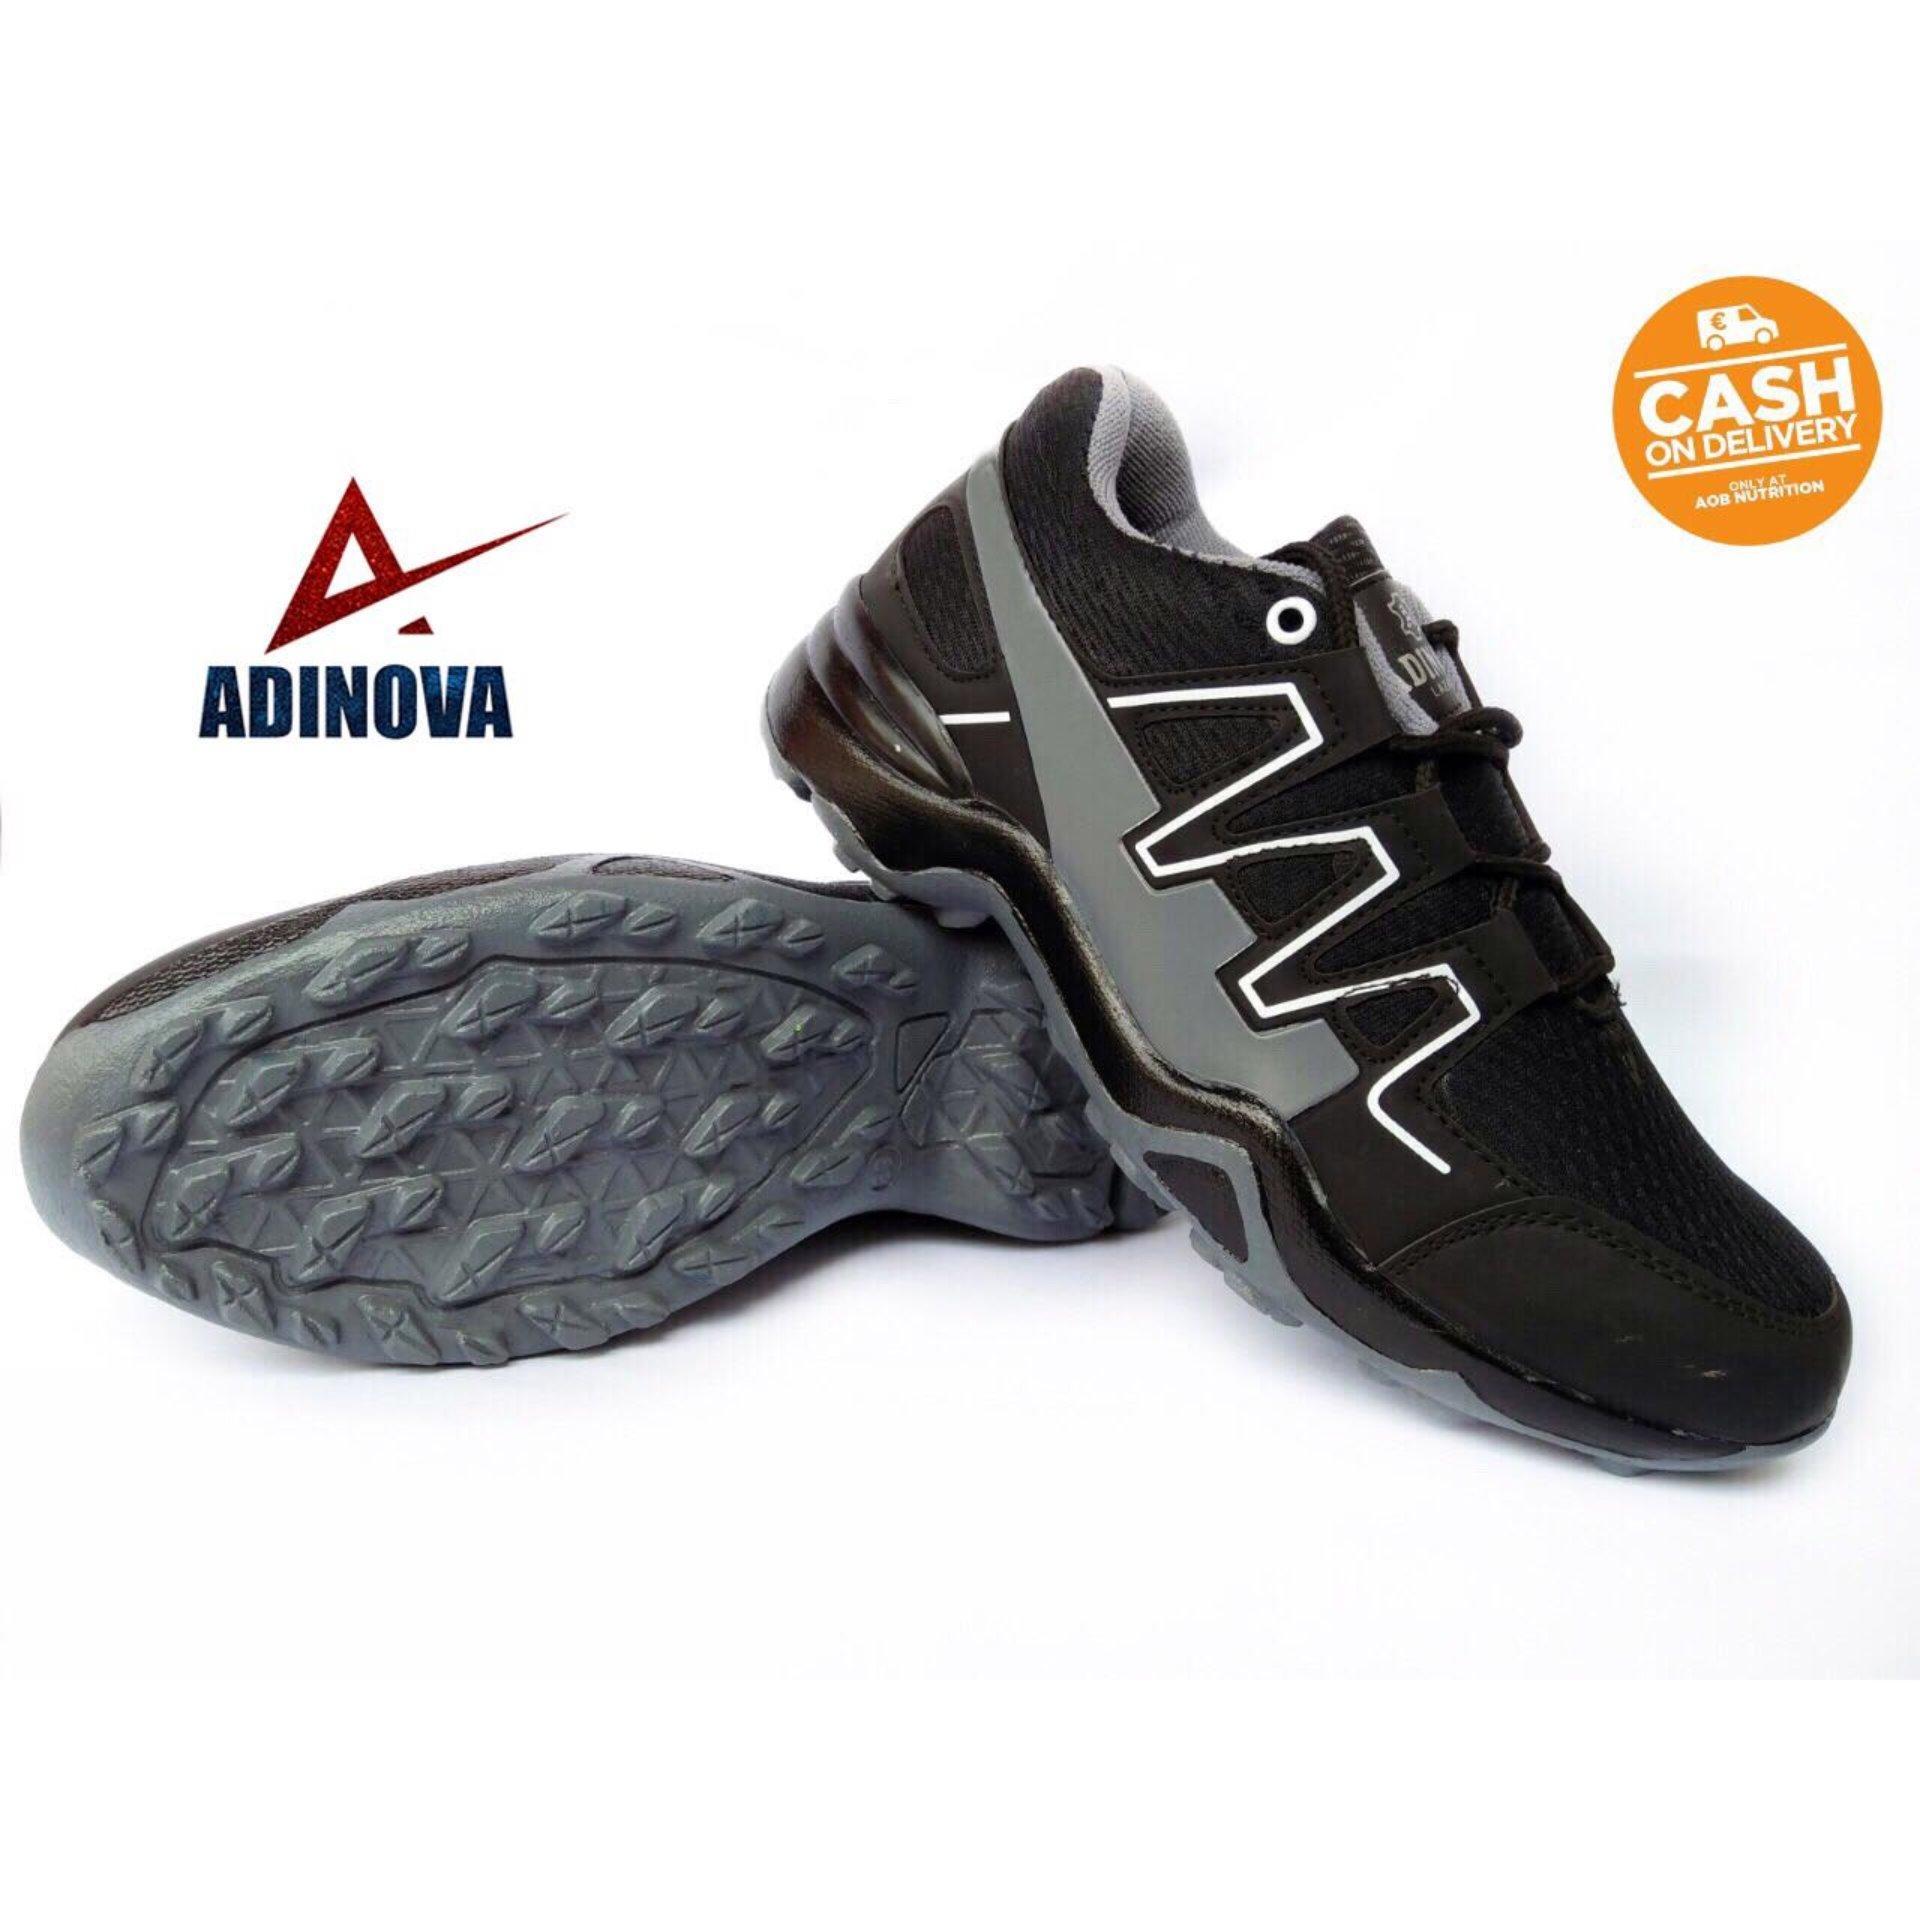 da0905dccc9b Adinova Shoes Sepatu Sport Solomo  Sepatu Olahraga   sepatu Gaya   Sepatu  Santai  Sepatu